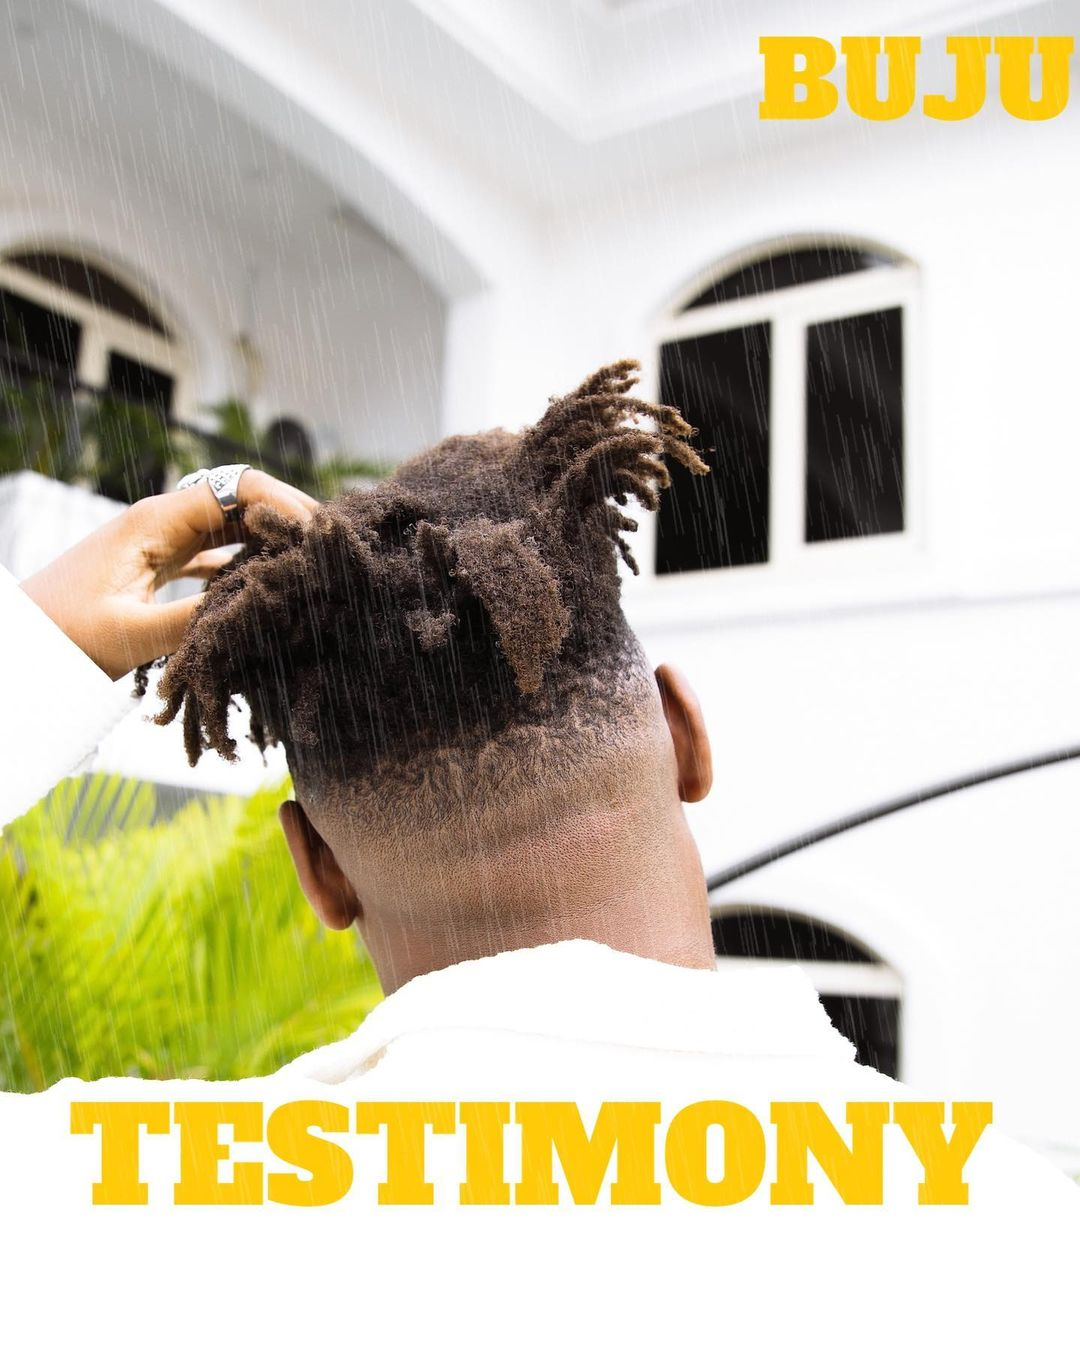 New Music: Buju – Testimony